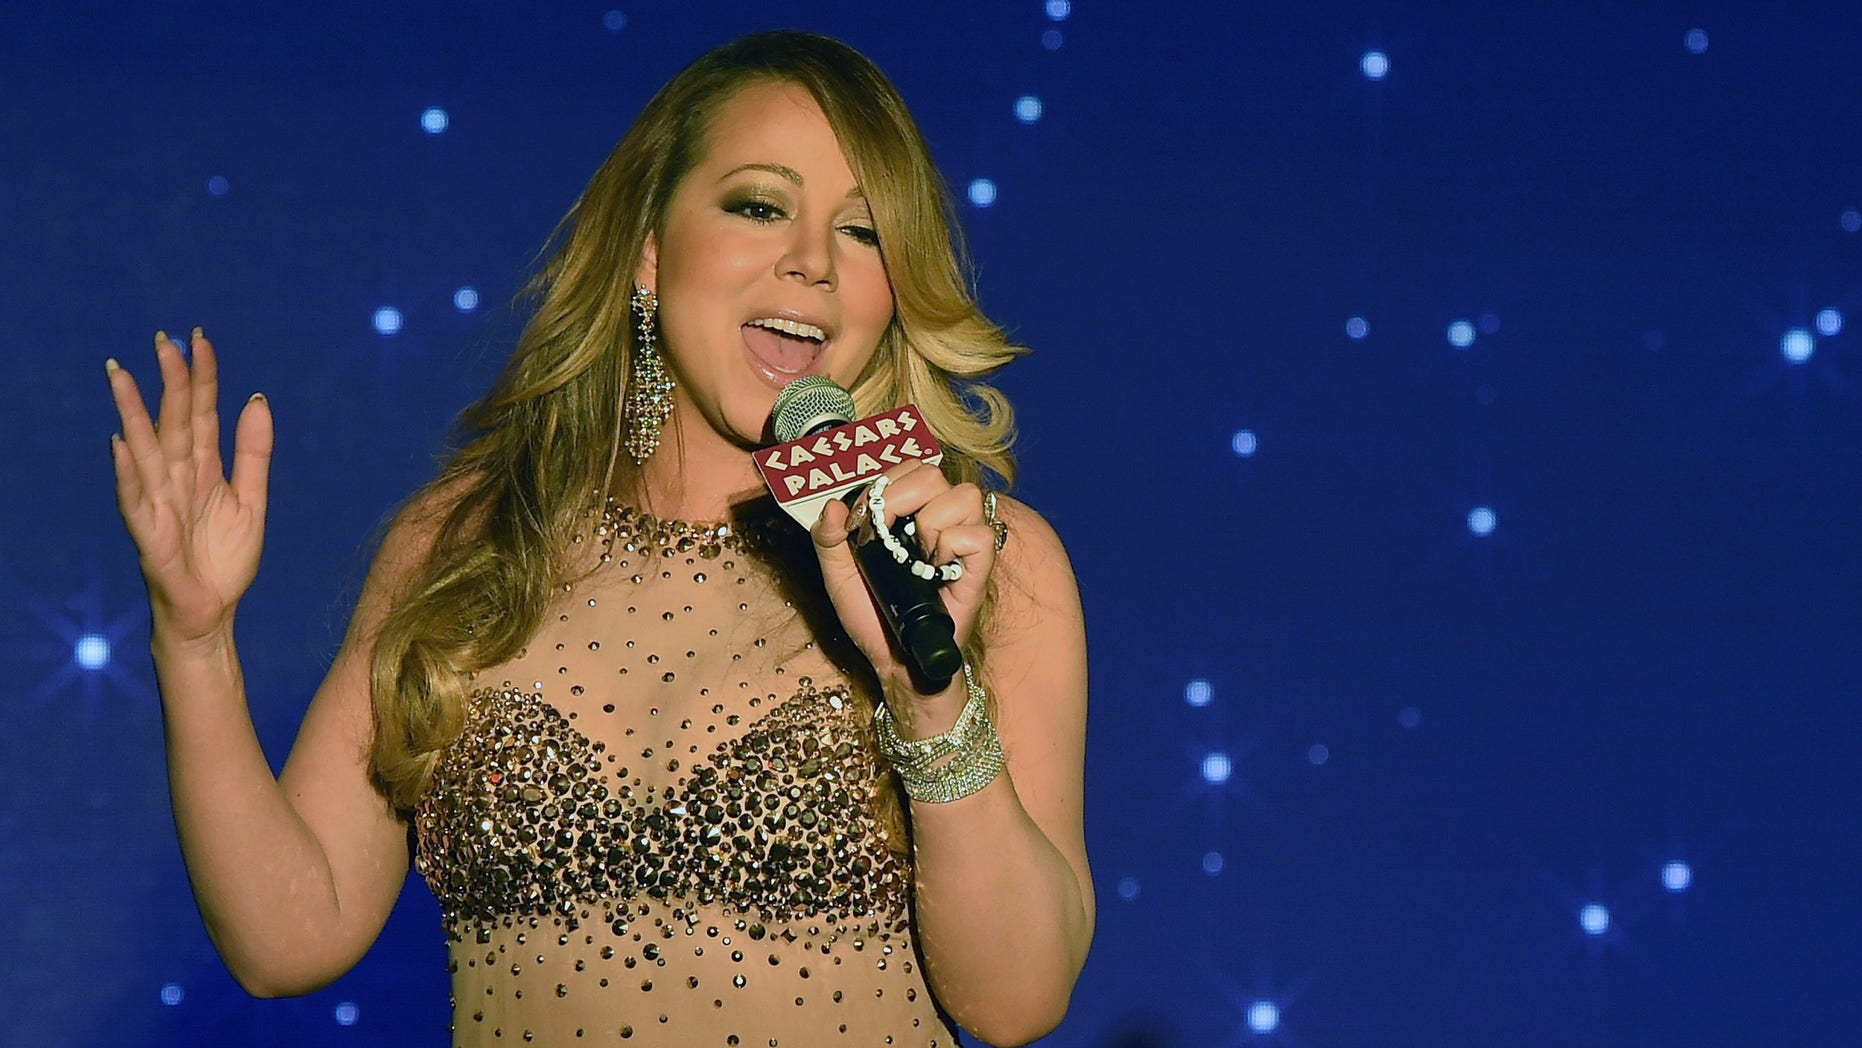 Mariah Carey on April 27, 2015 in Las Vegas, Nevada.